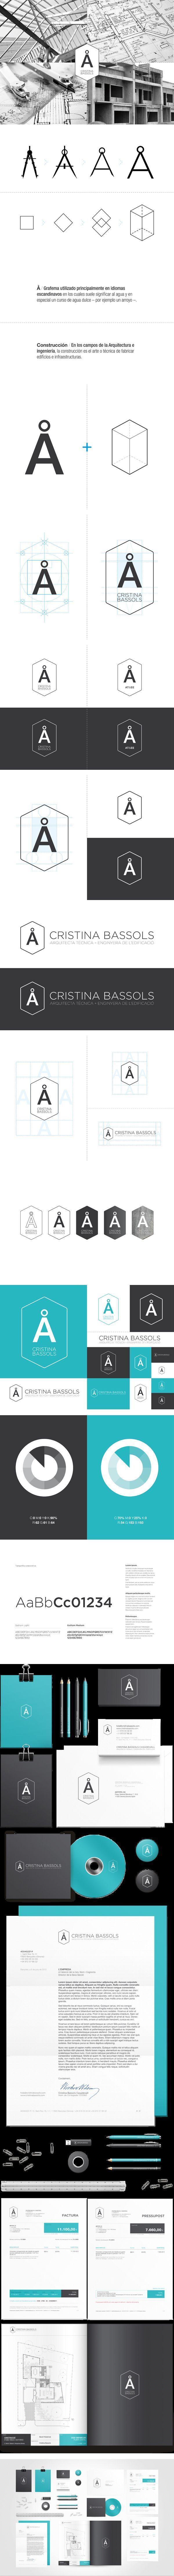 Logo的设计与应用